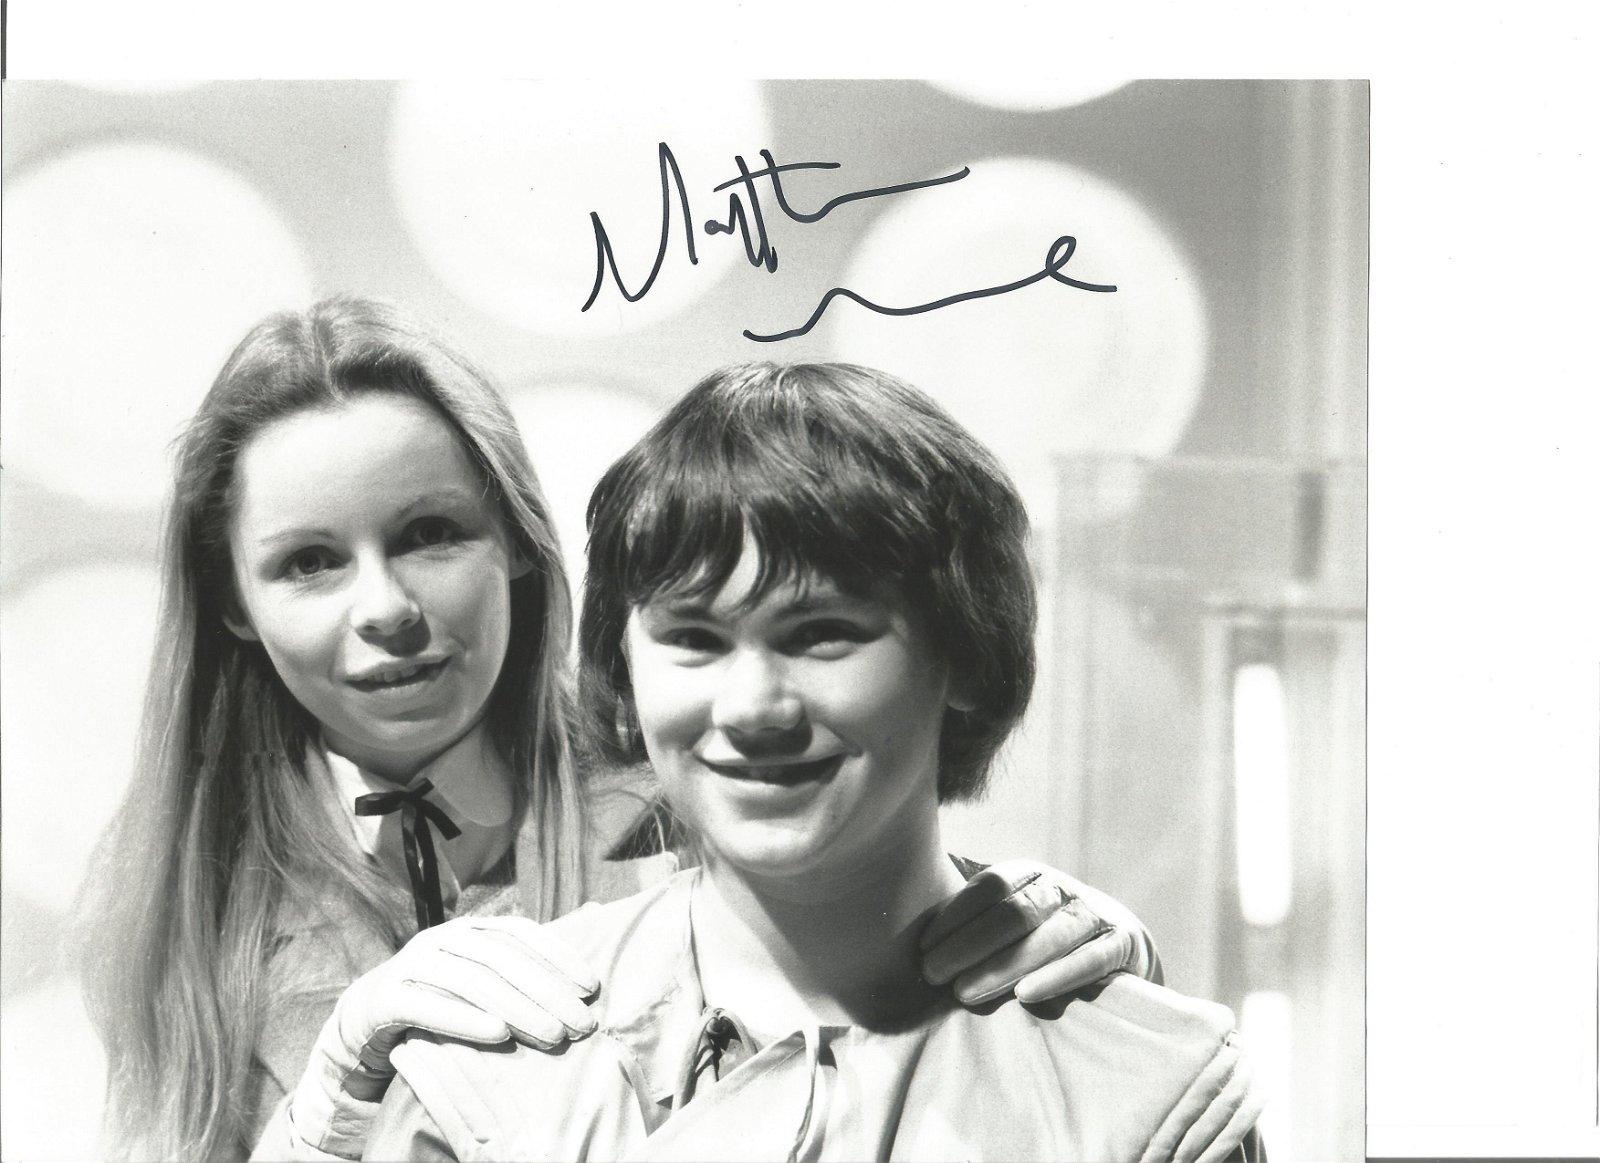 Mathew Waterhouse 8x10 signed black and white photo